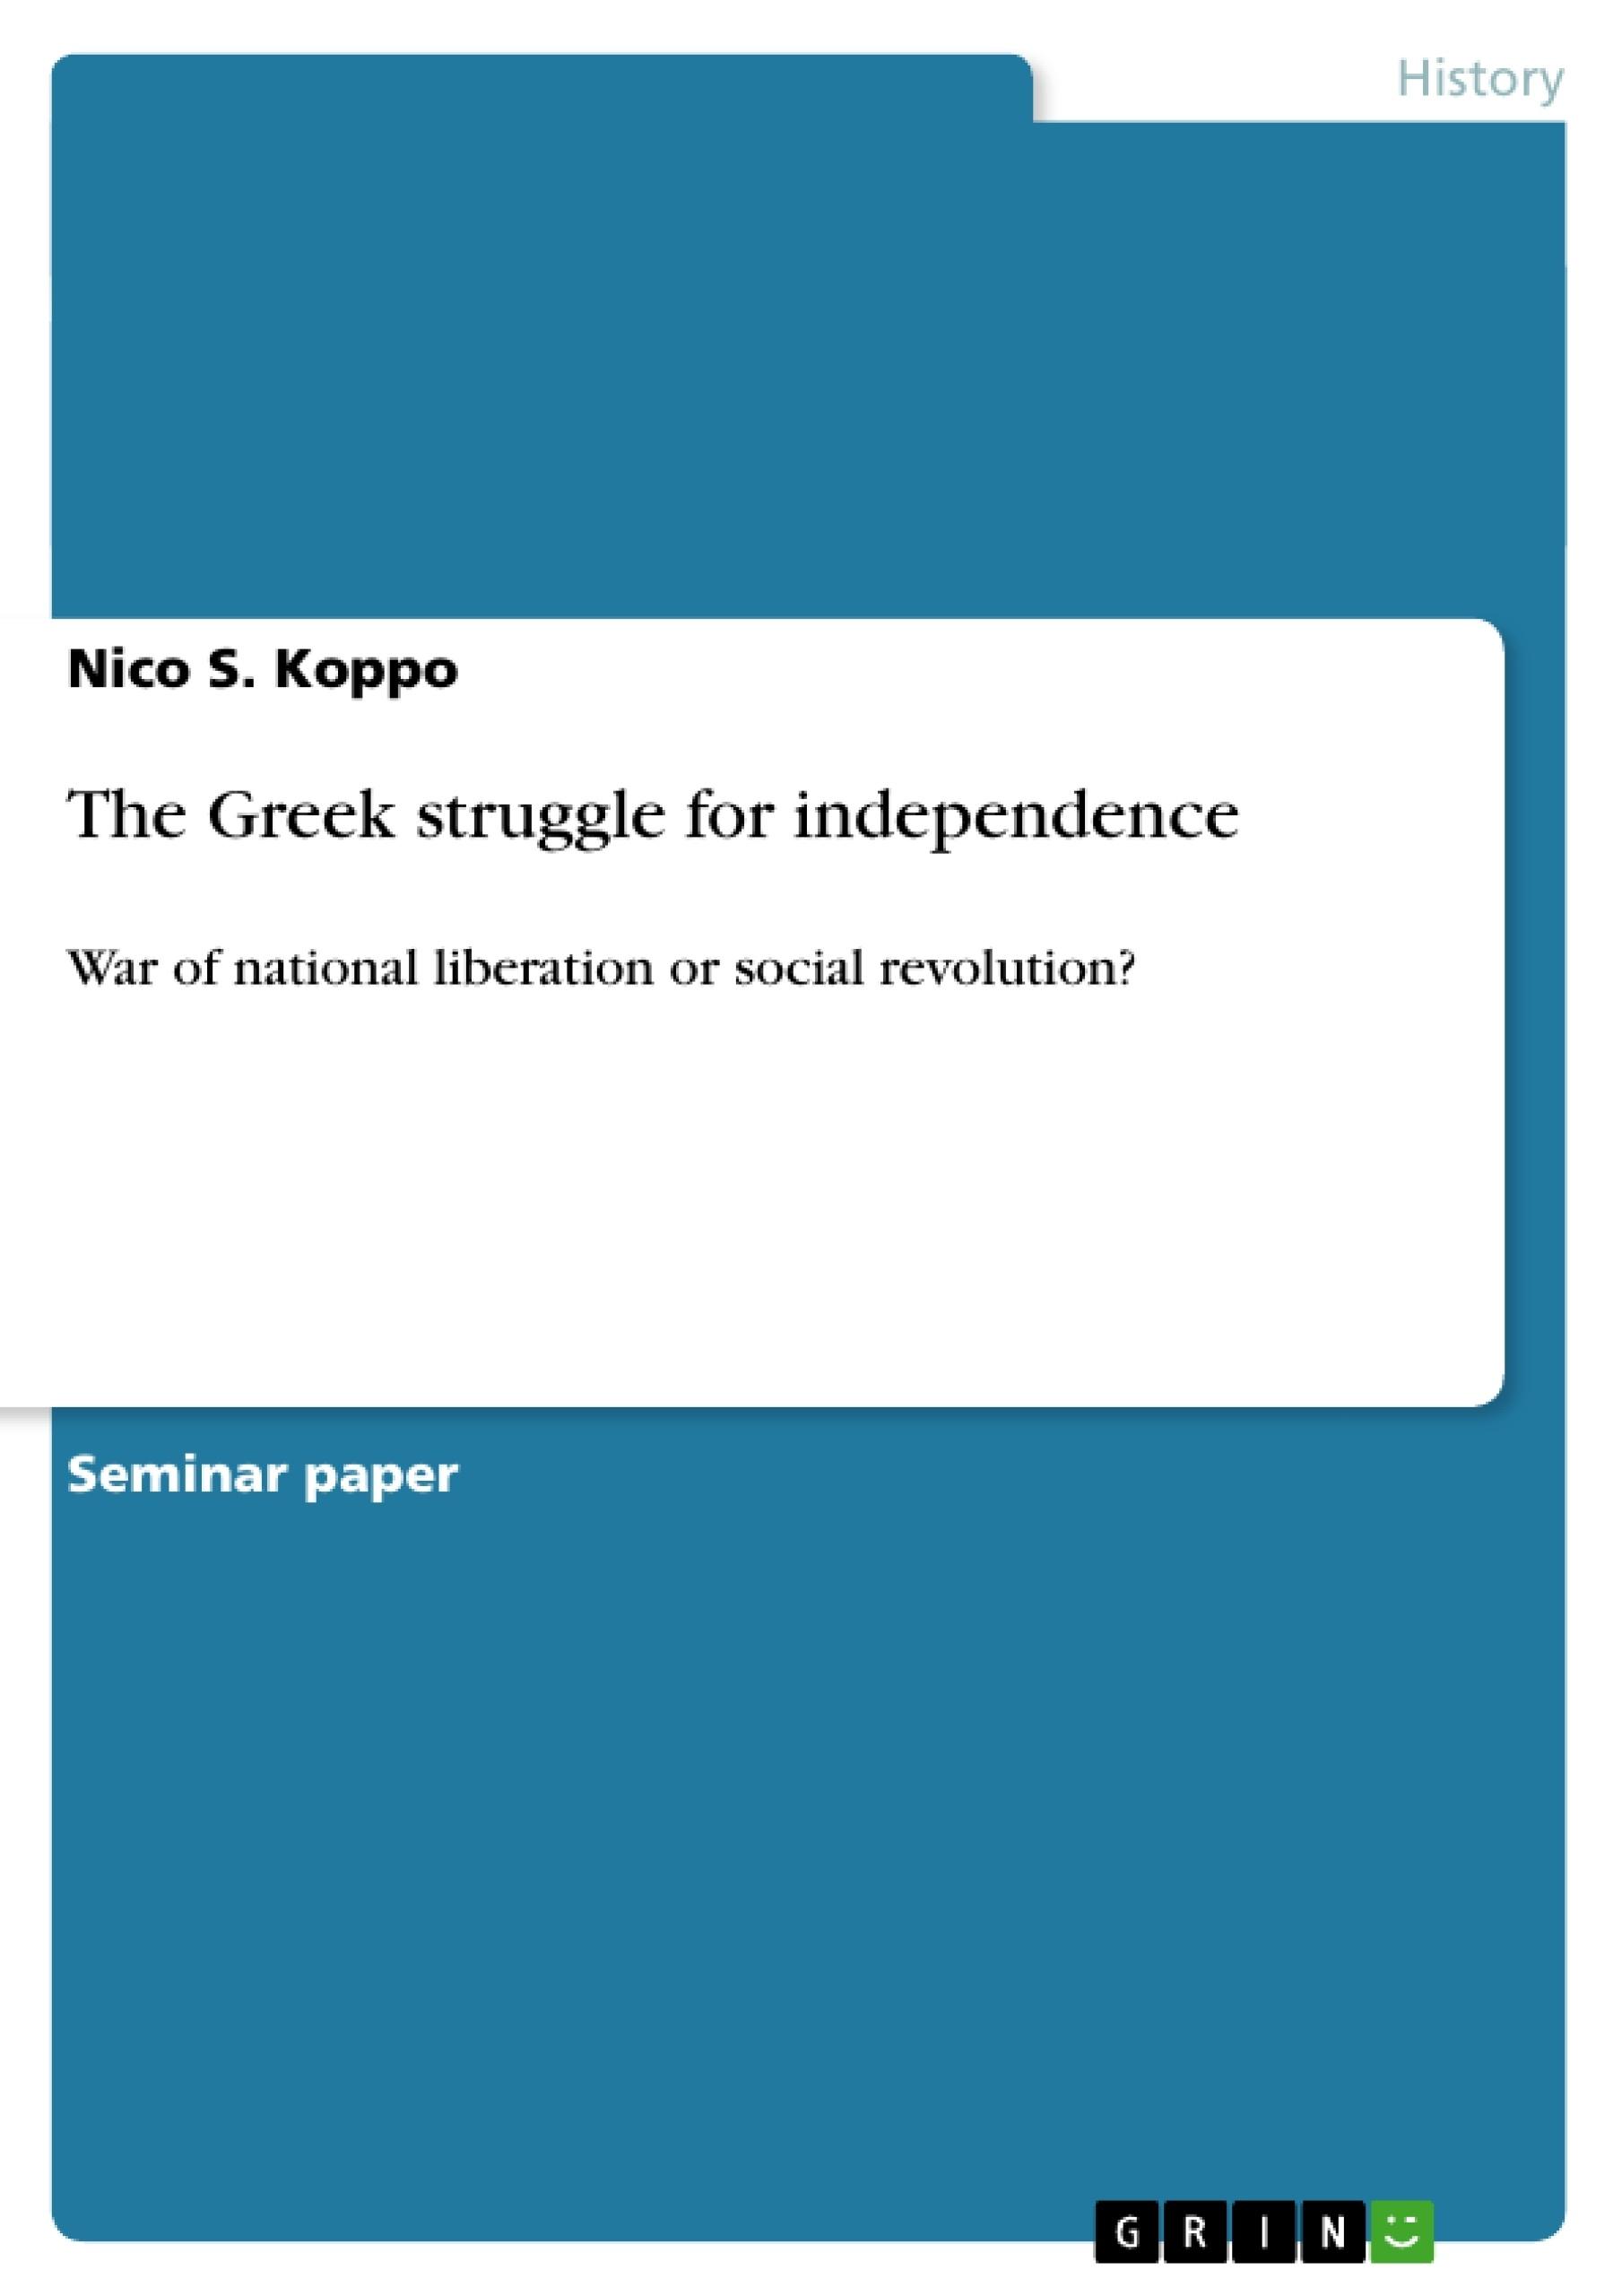 Title: The Greek struggle for independence